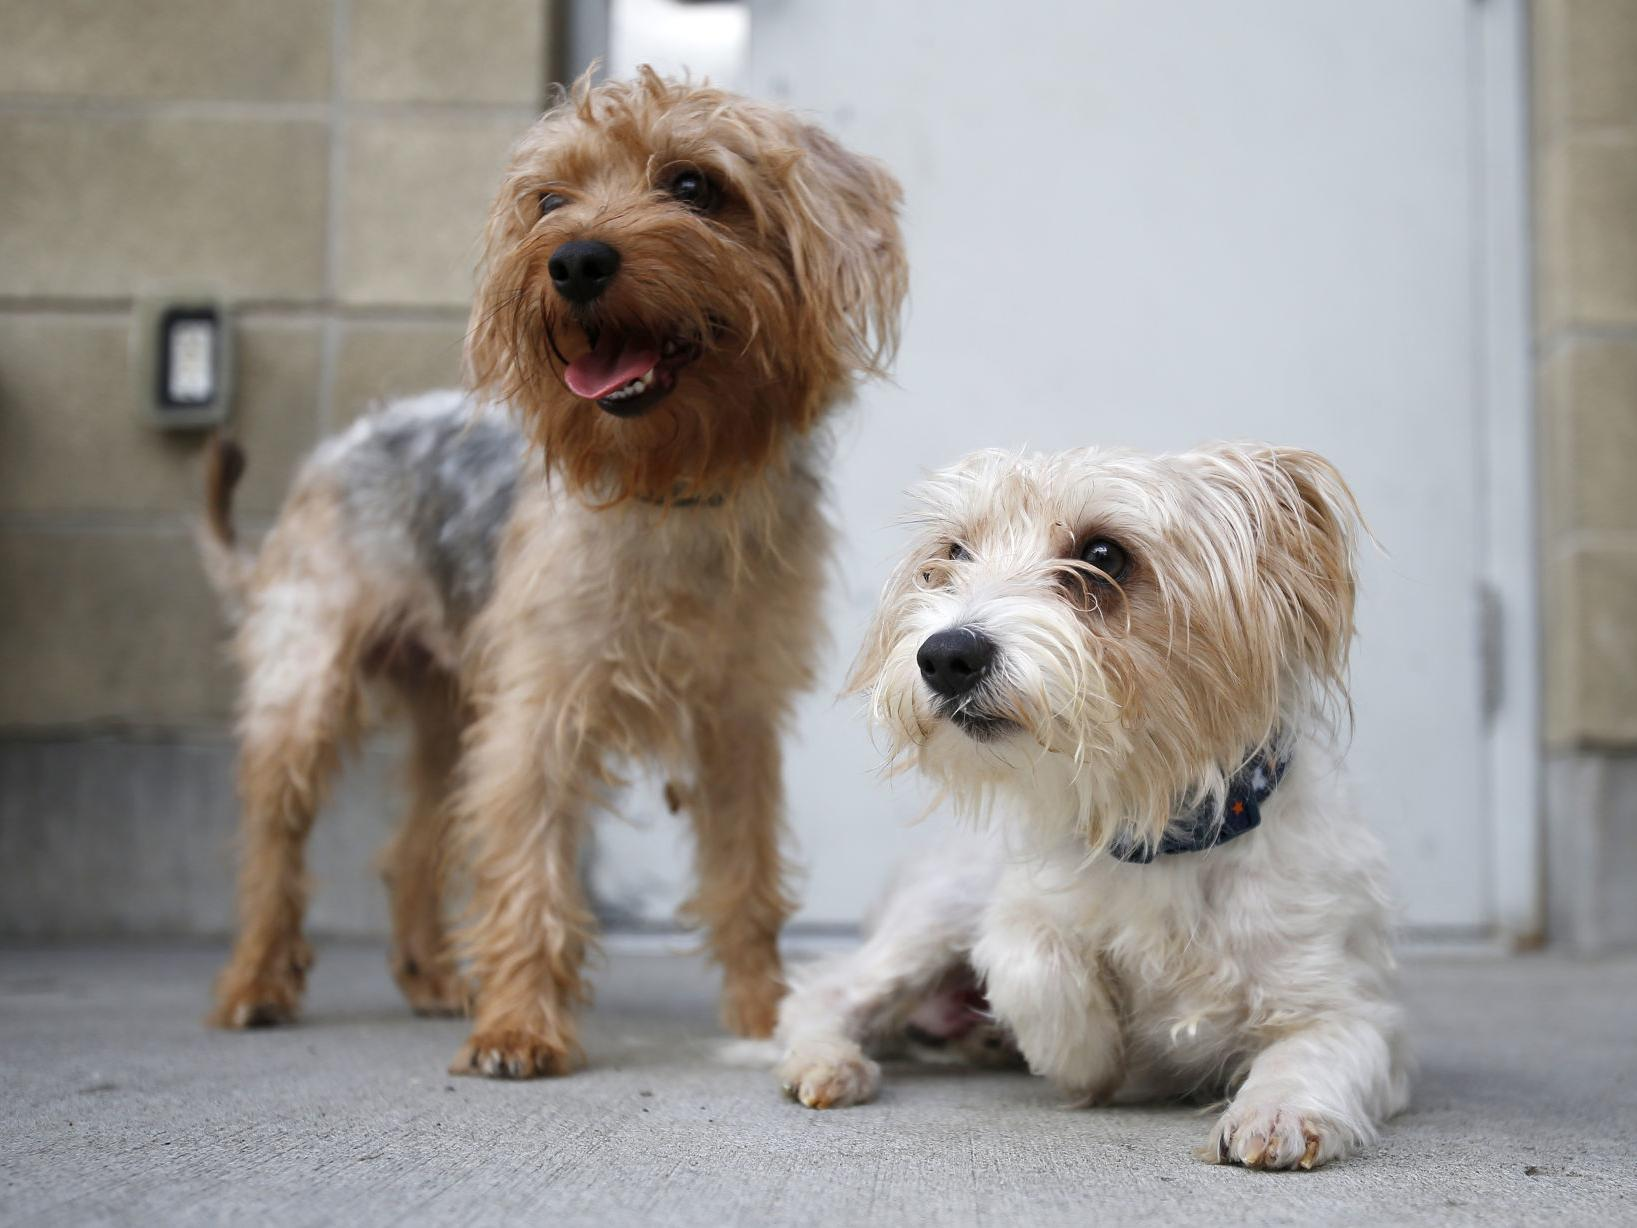 Billings Animal Shelter Adopting Out